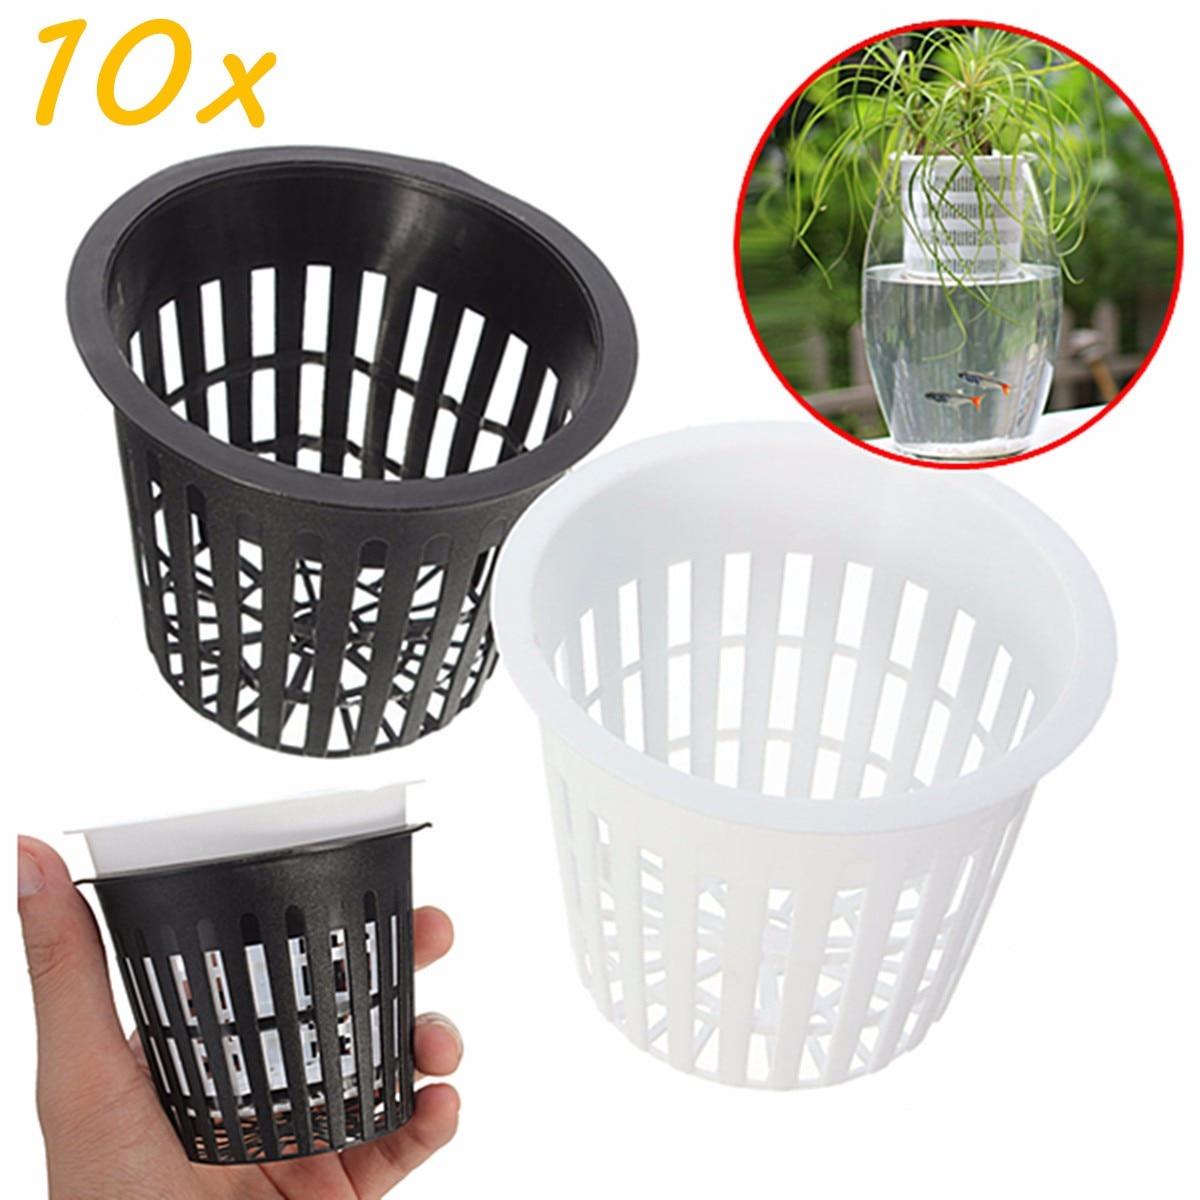 10x Mesh Pot Net Cup Basket Garden Plant Grow Vegetable Germinate Nursery PotsXJ